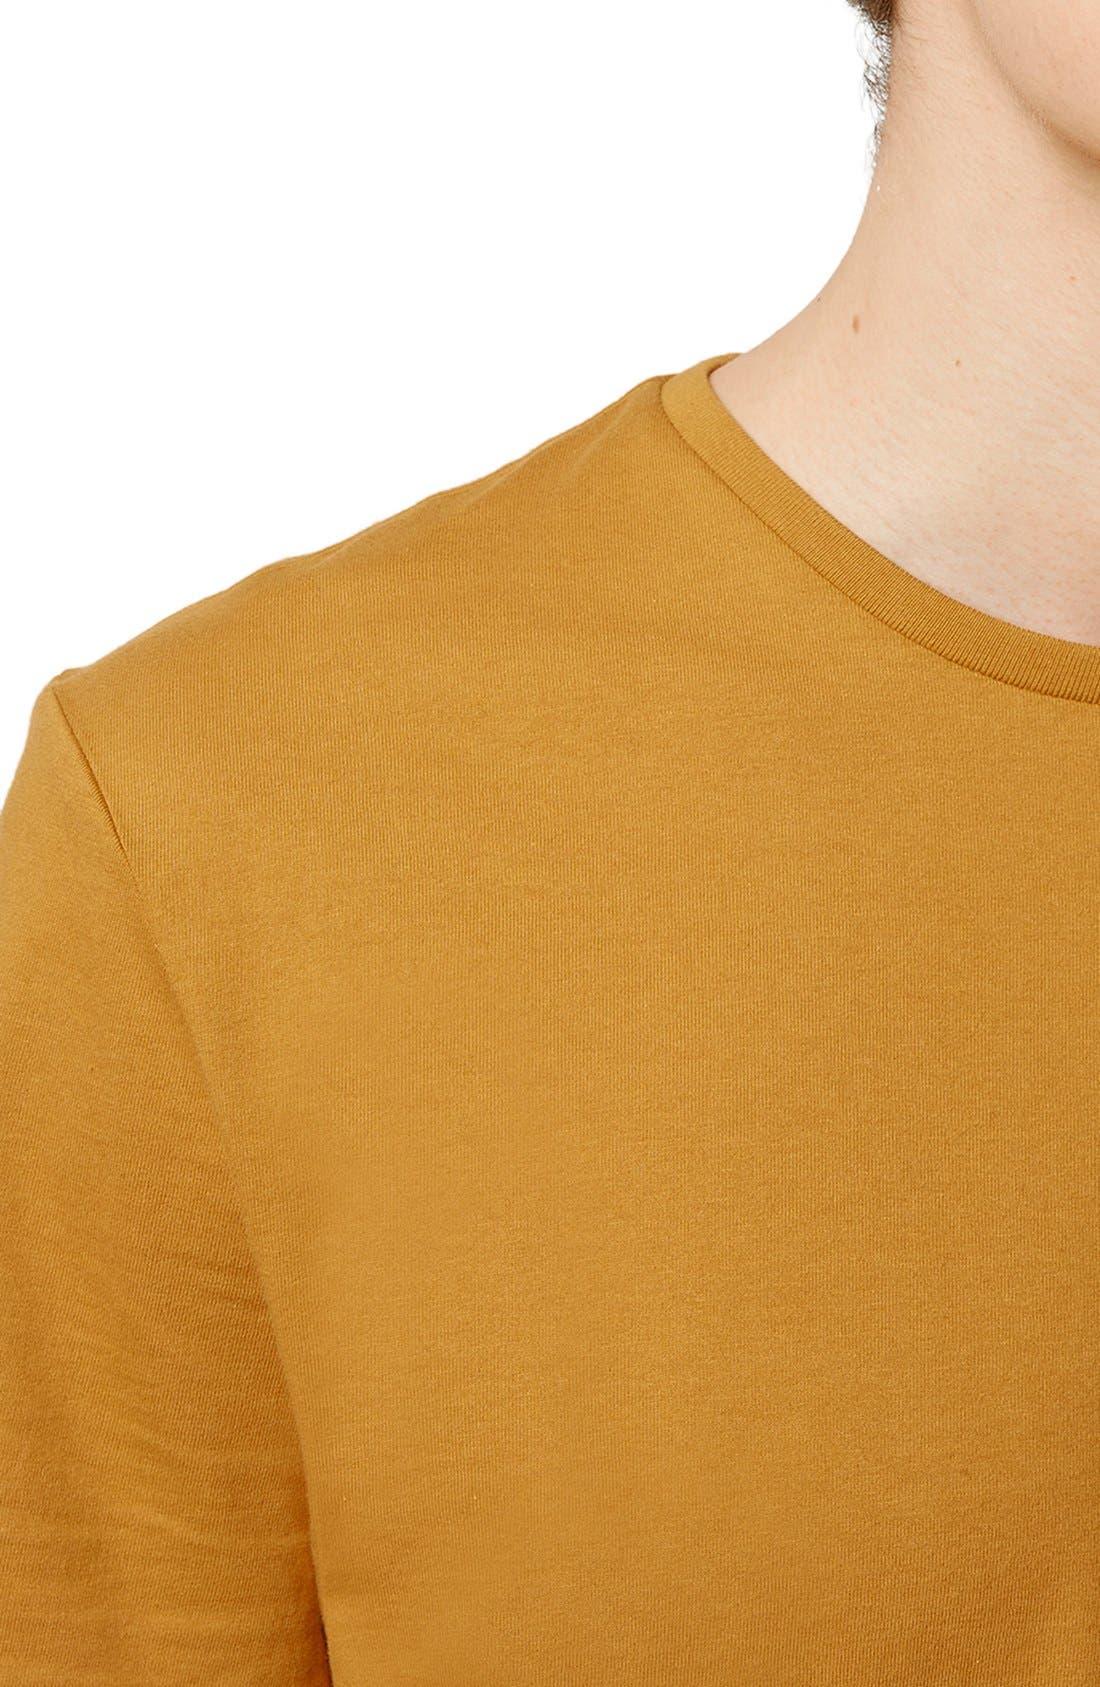 Slim Fit Crewneck T-Shirt,                             Alternate thumbnail 281, color,